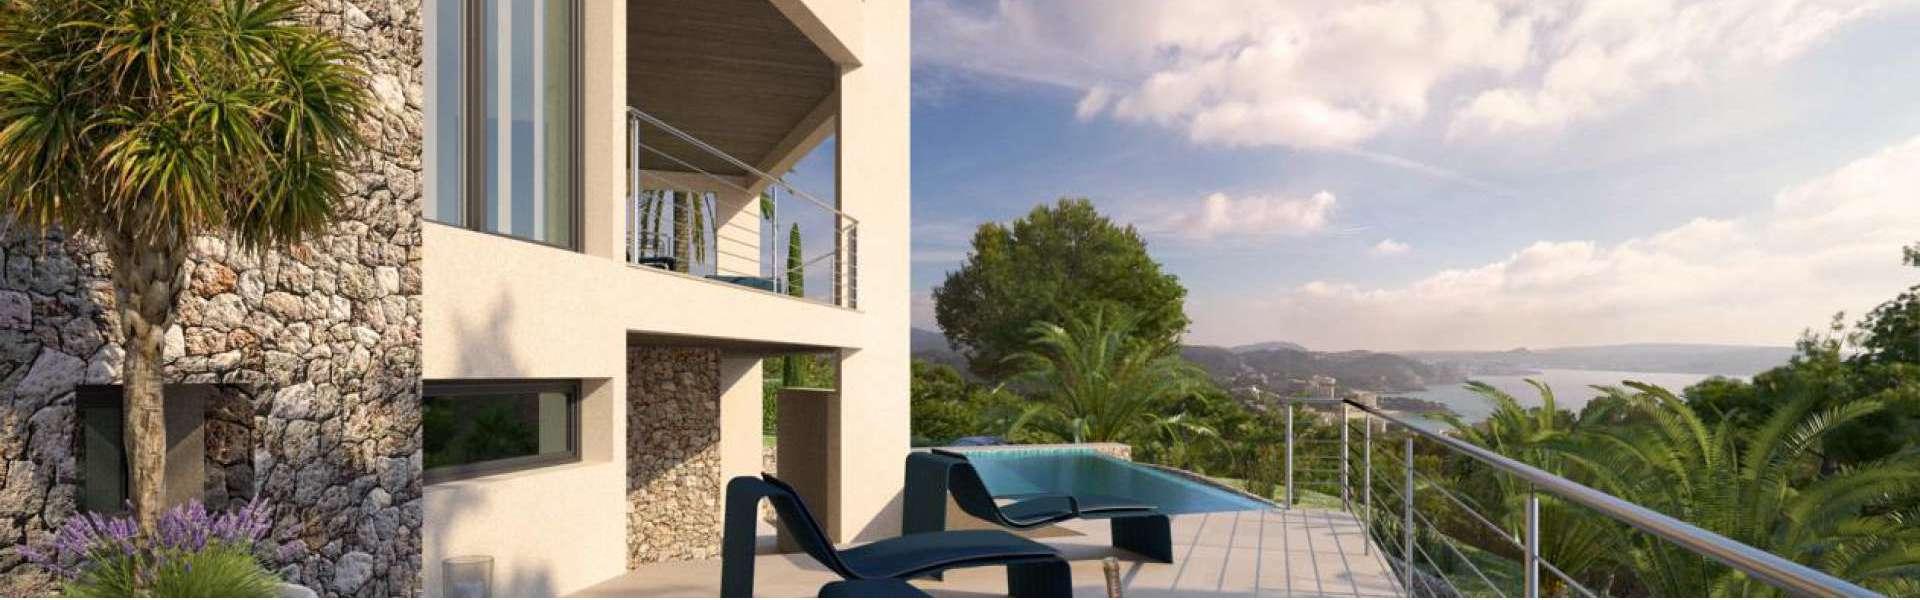 Paguera - Großzügiges Baugrundstück/Projekt mit Blick